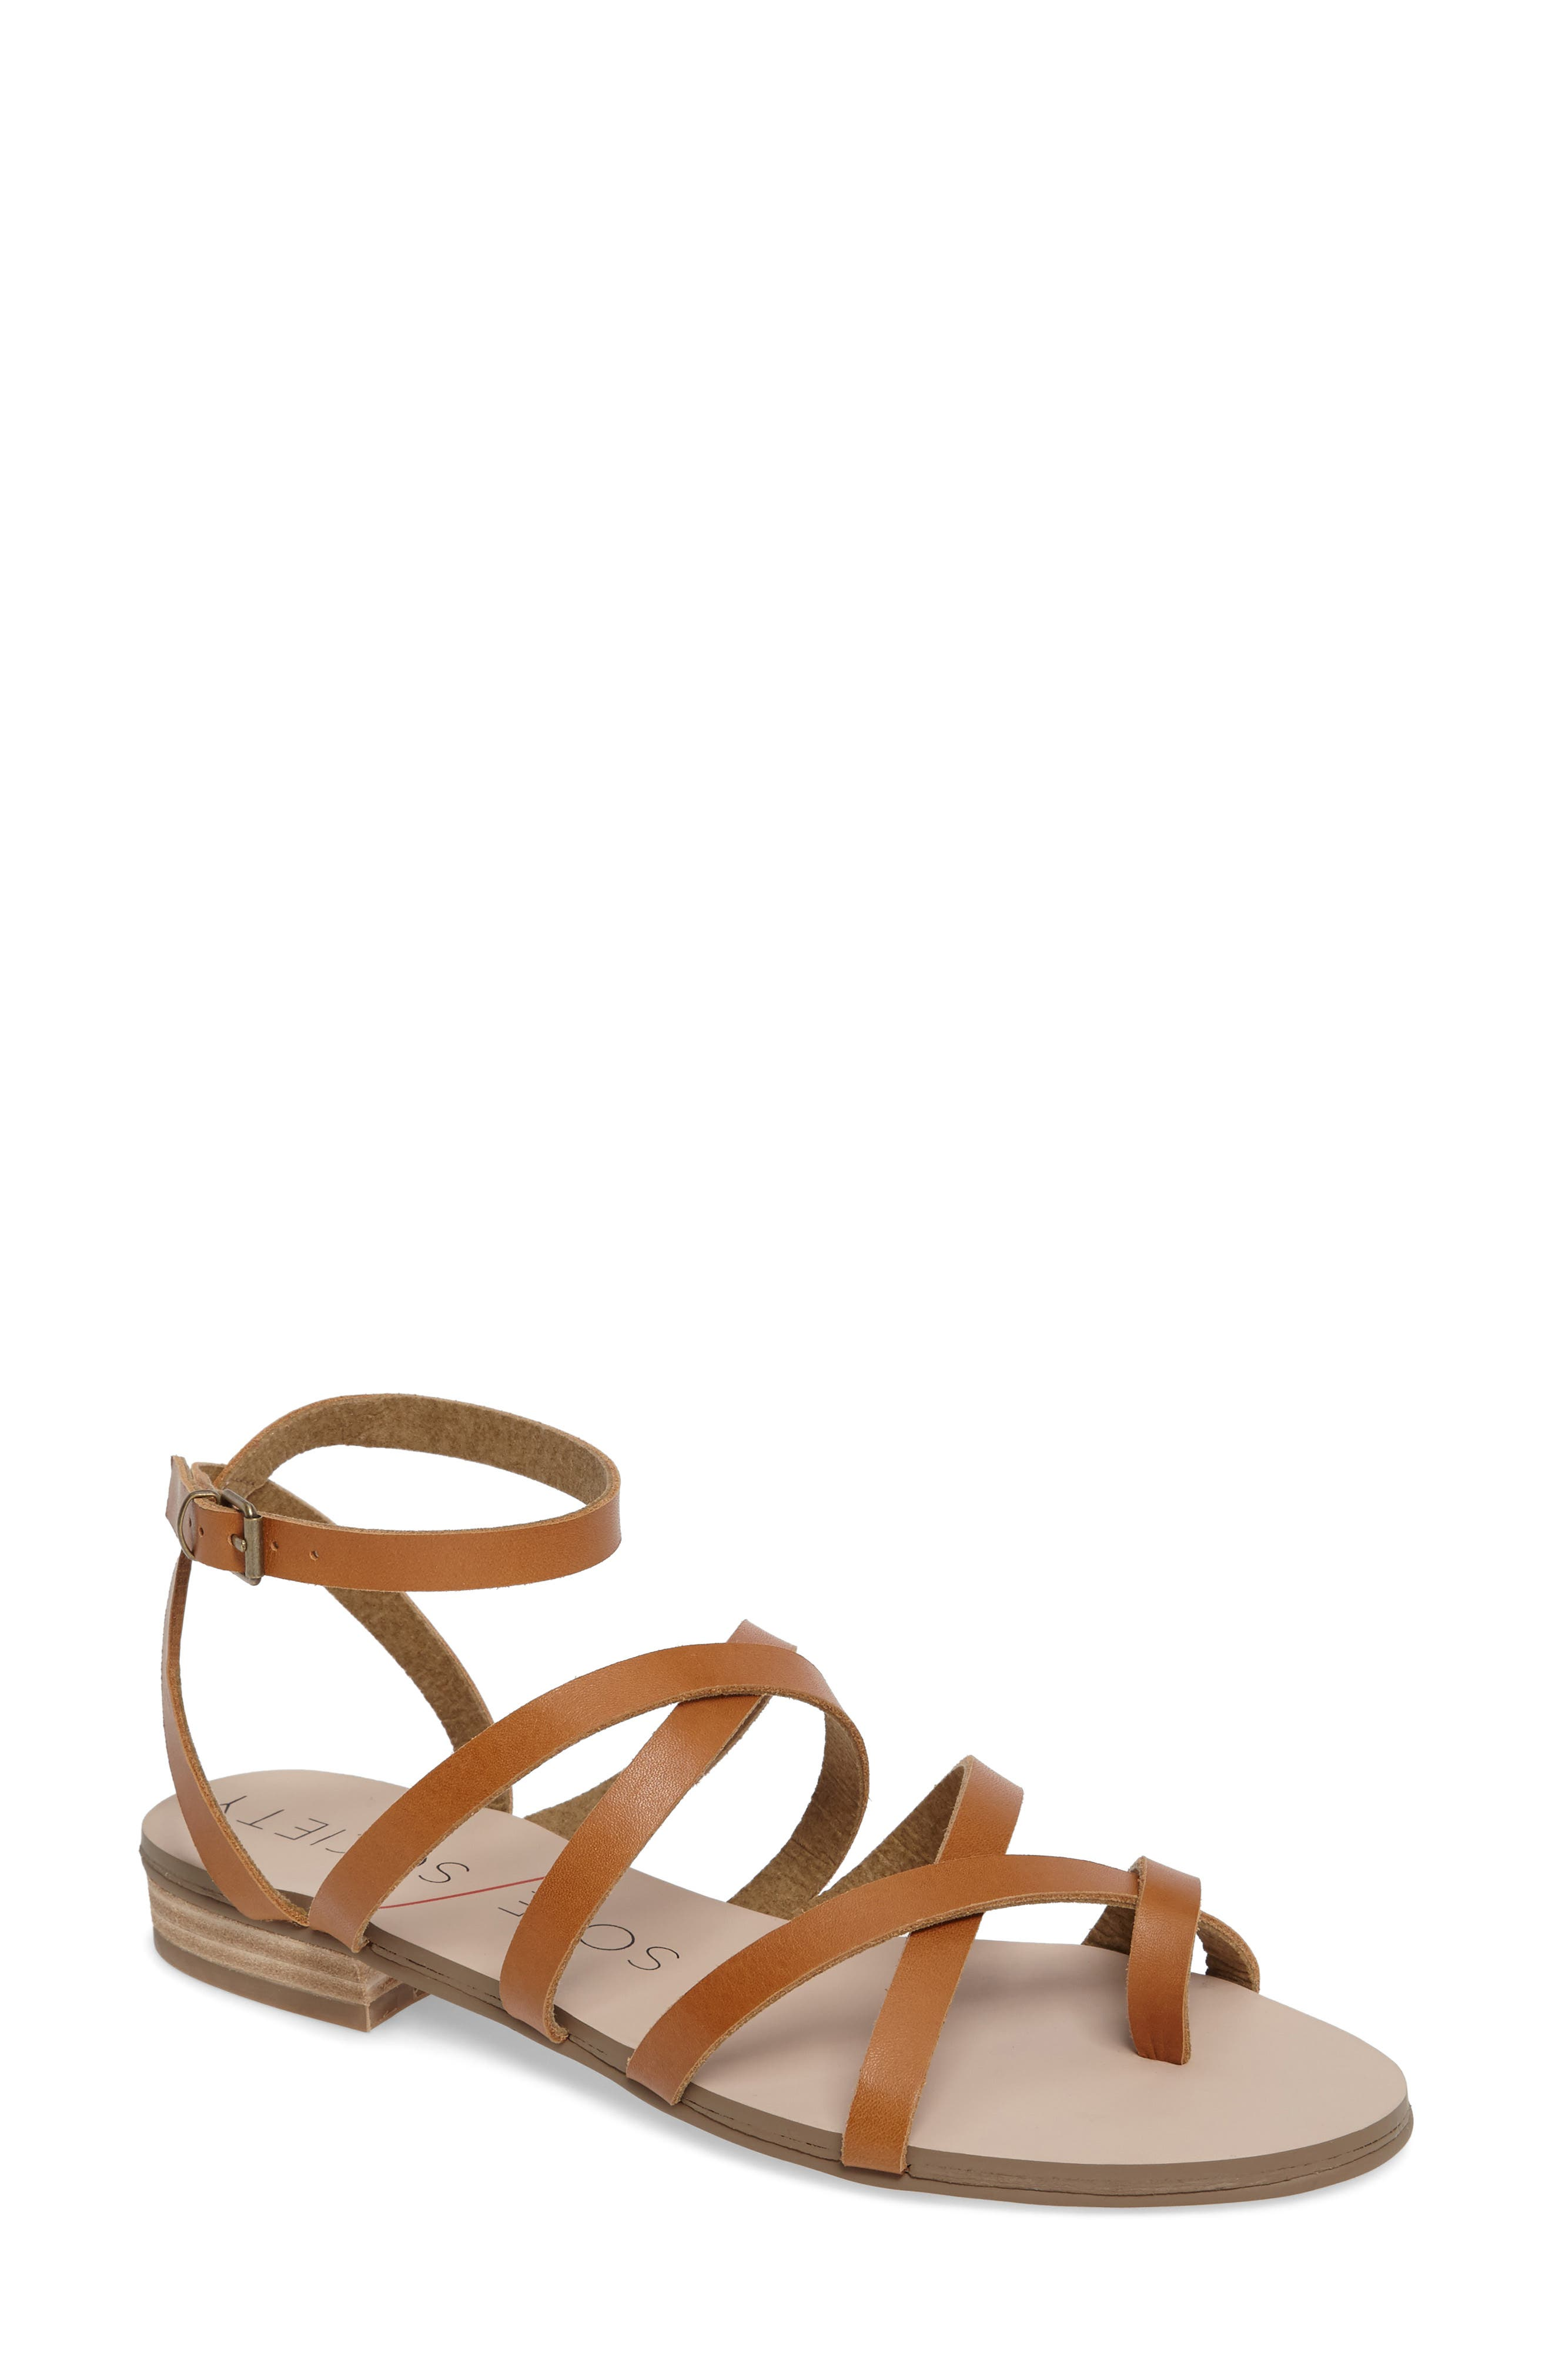 SOLE SOCIETY Koko Flat Sandal